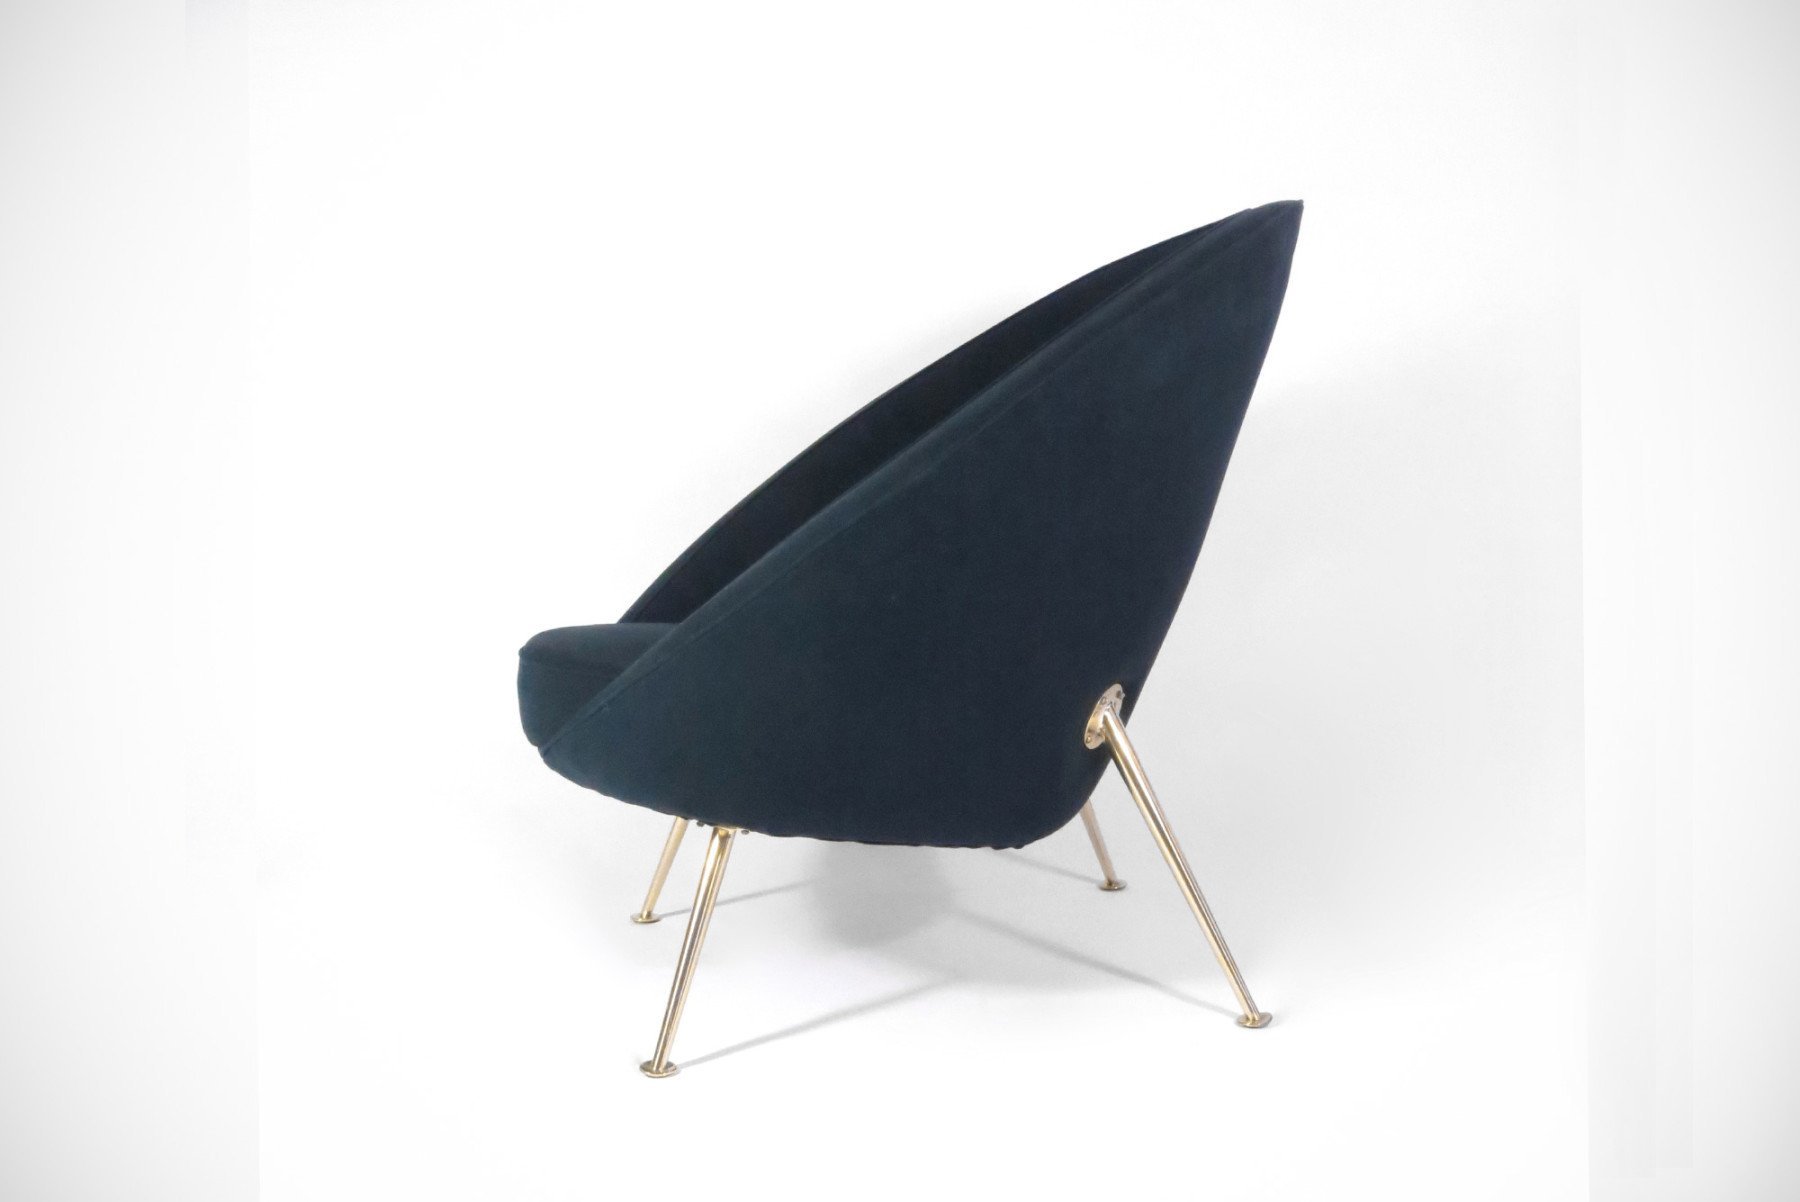 Ico Parisi |   Egg chair, model no. 813